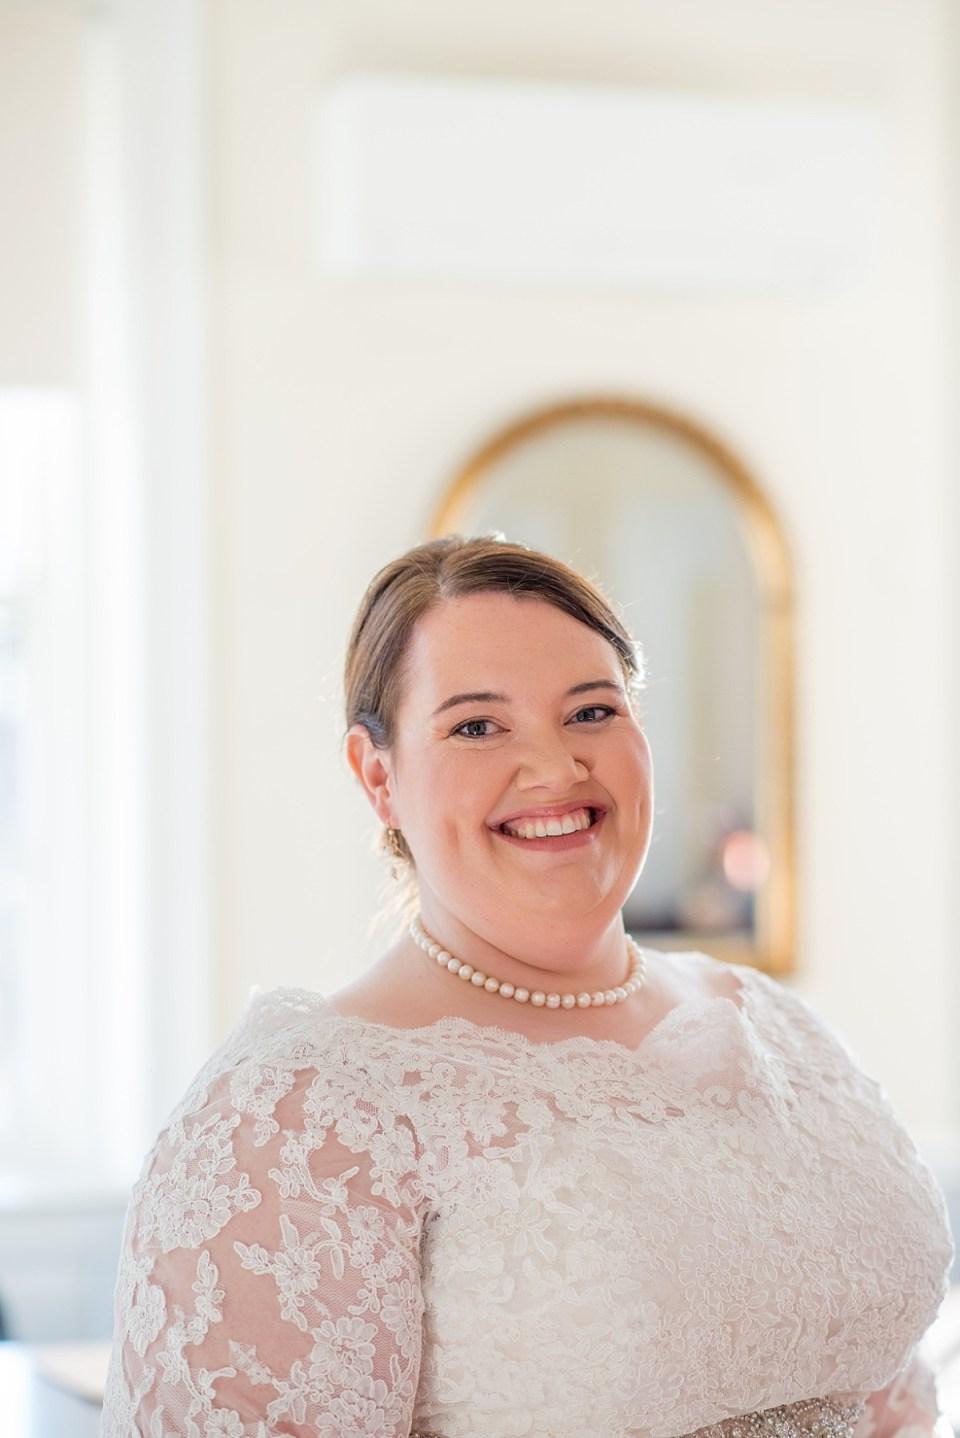 Woodend Sanctuary Wedding with Washington Dc Wedding Photographer, Erin Tetterton Photography